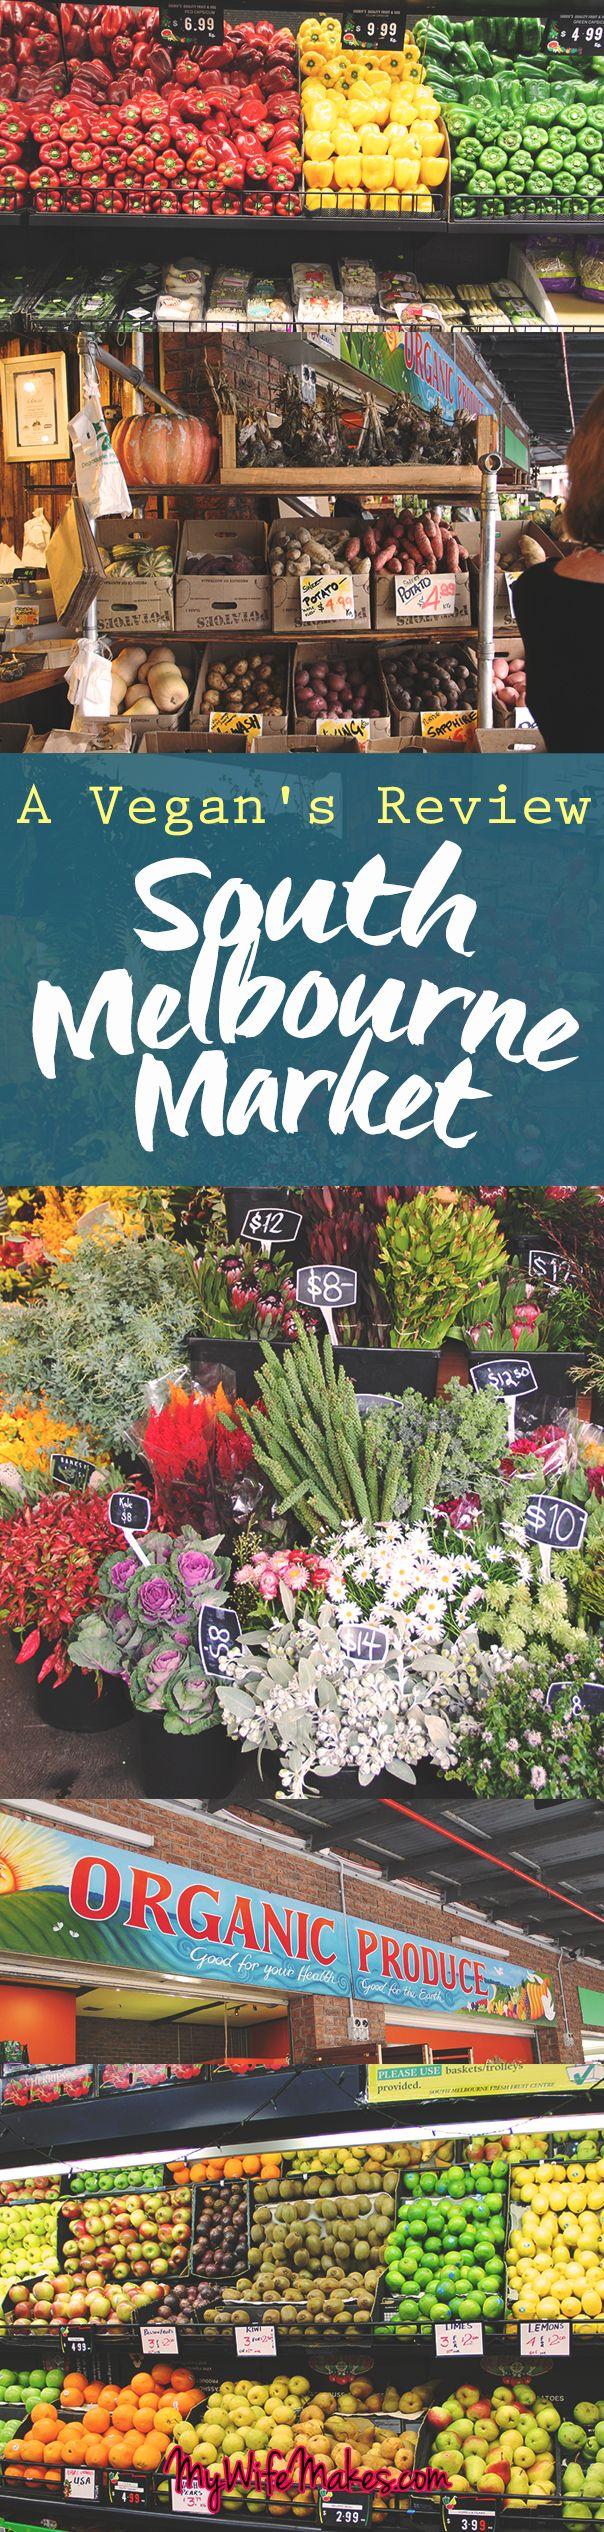 A review of South Melbourne Market as a vegan's paradise.